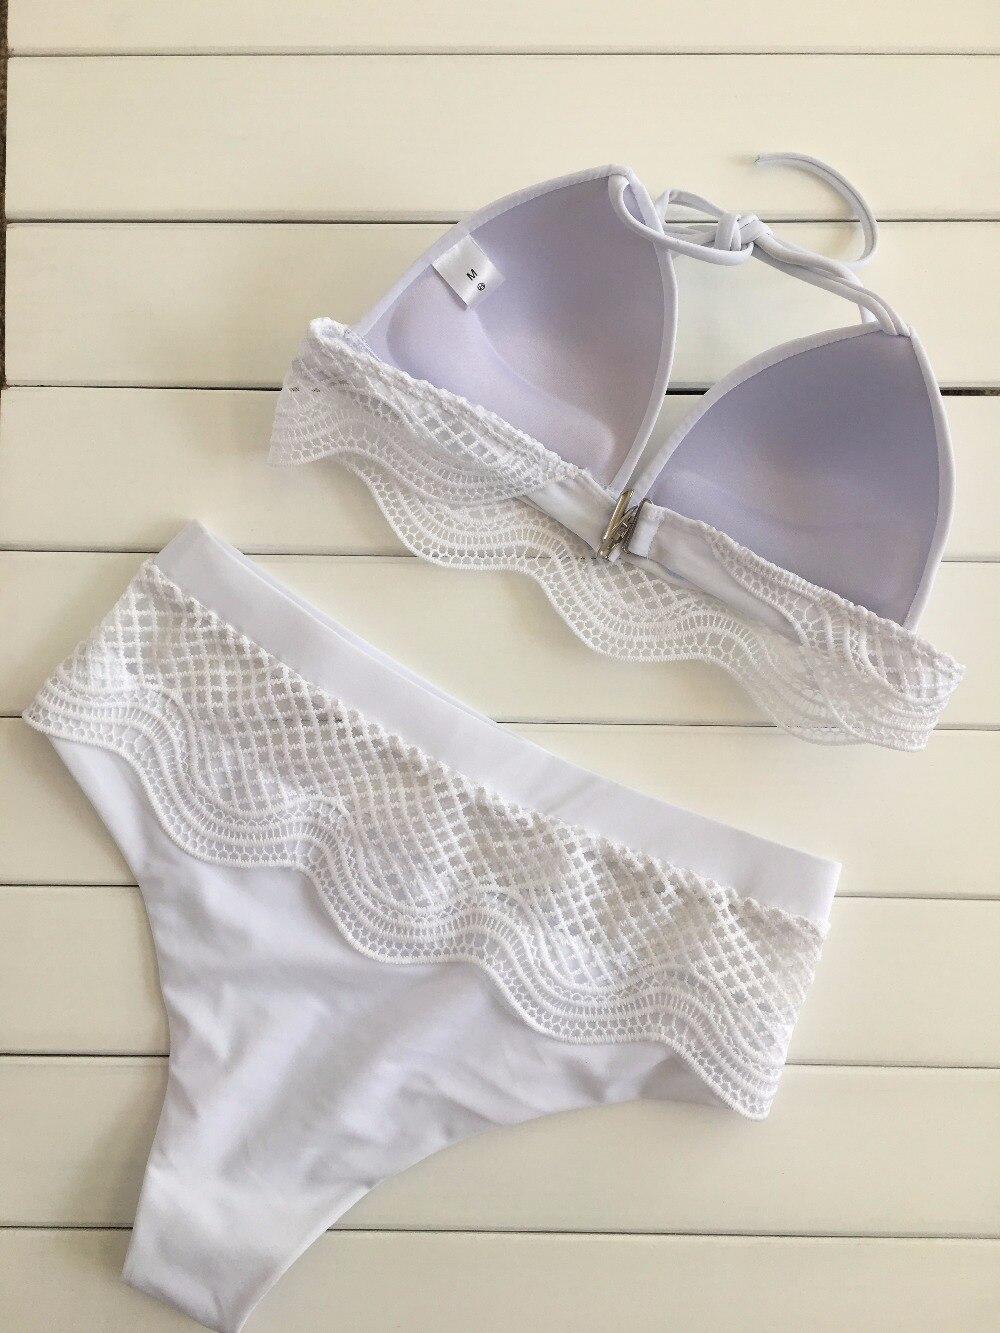 e9058aad3a5 Rhyme Lady Women sexy bikini set girls Beach Bathing Suit Swimsuit Push Up 2018  high waist. артикул: 32862353455